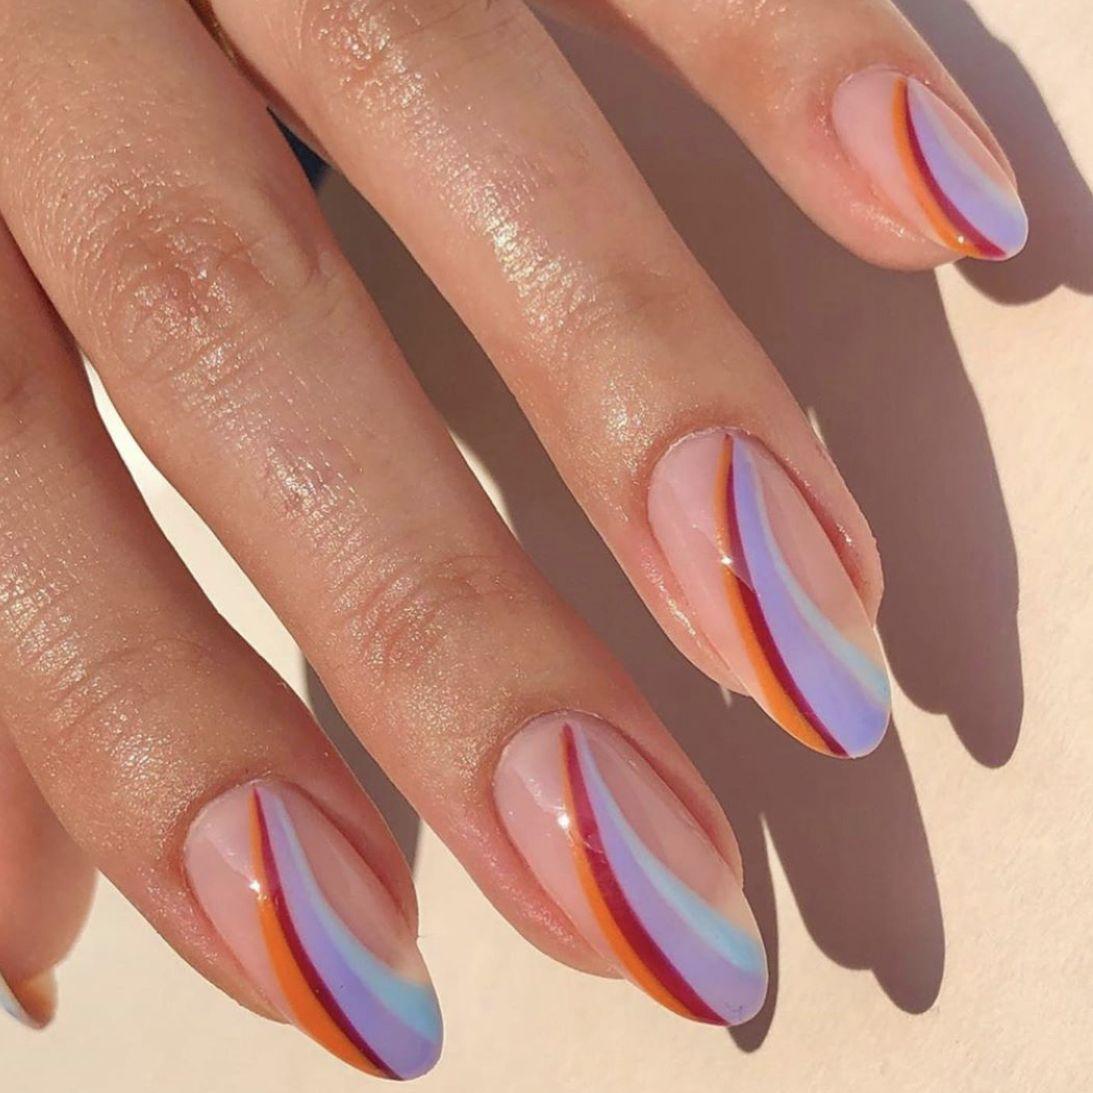 Pin by ᴊᴏssʏ ღ on manicure | Minimalist nails, Minimal